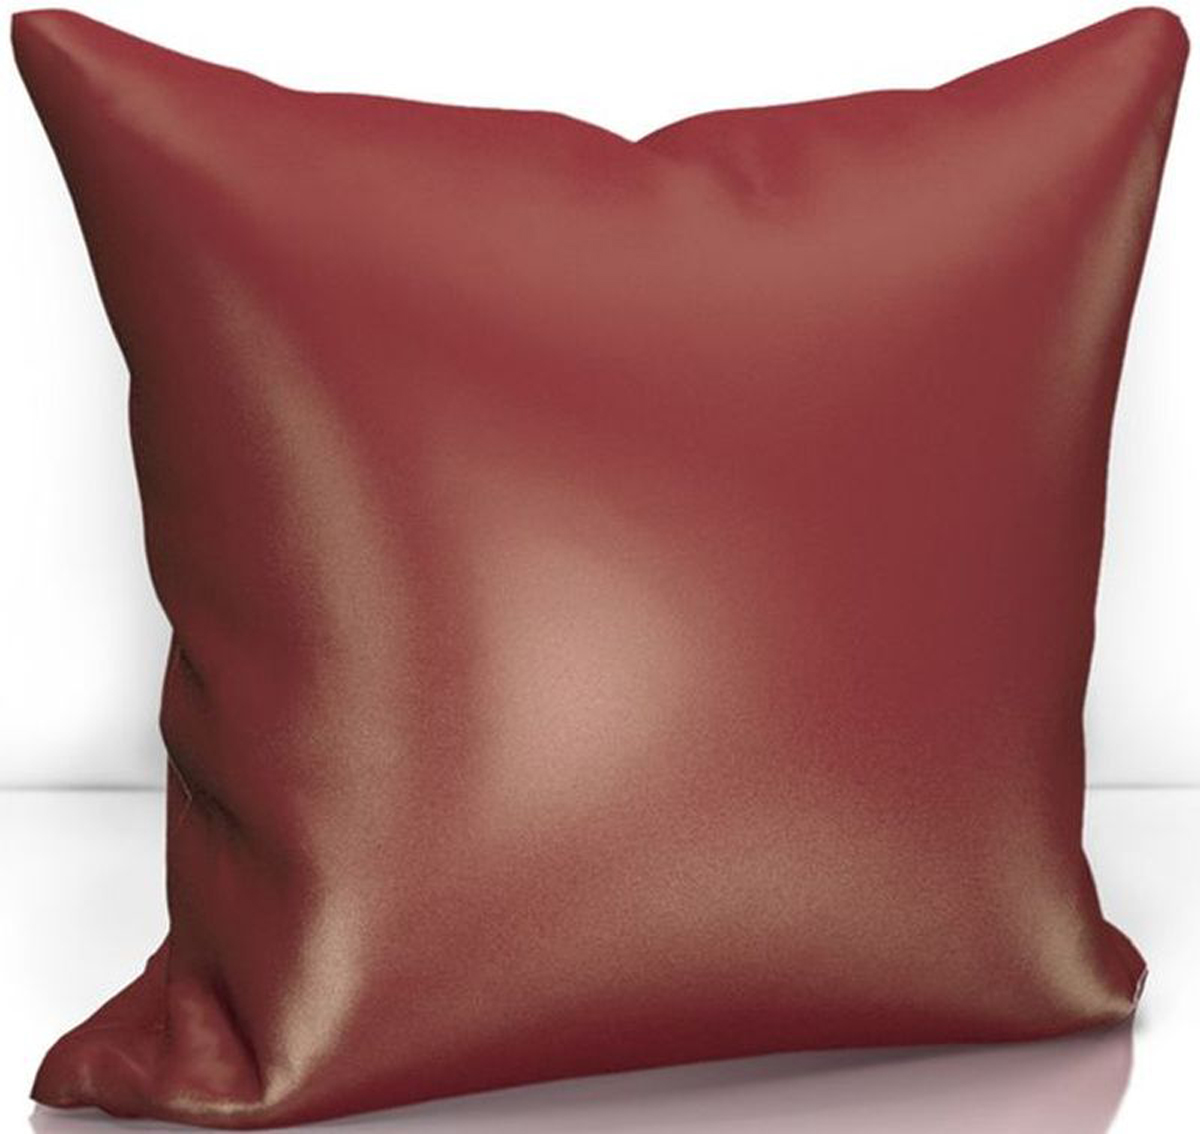 Подушка декоративная KauffOrt Эвелина, цвет: бордовый, 40 х 40 см декоративные подушки kauffort декоративная подушка agra 40х40